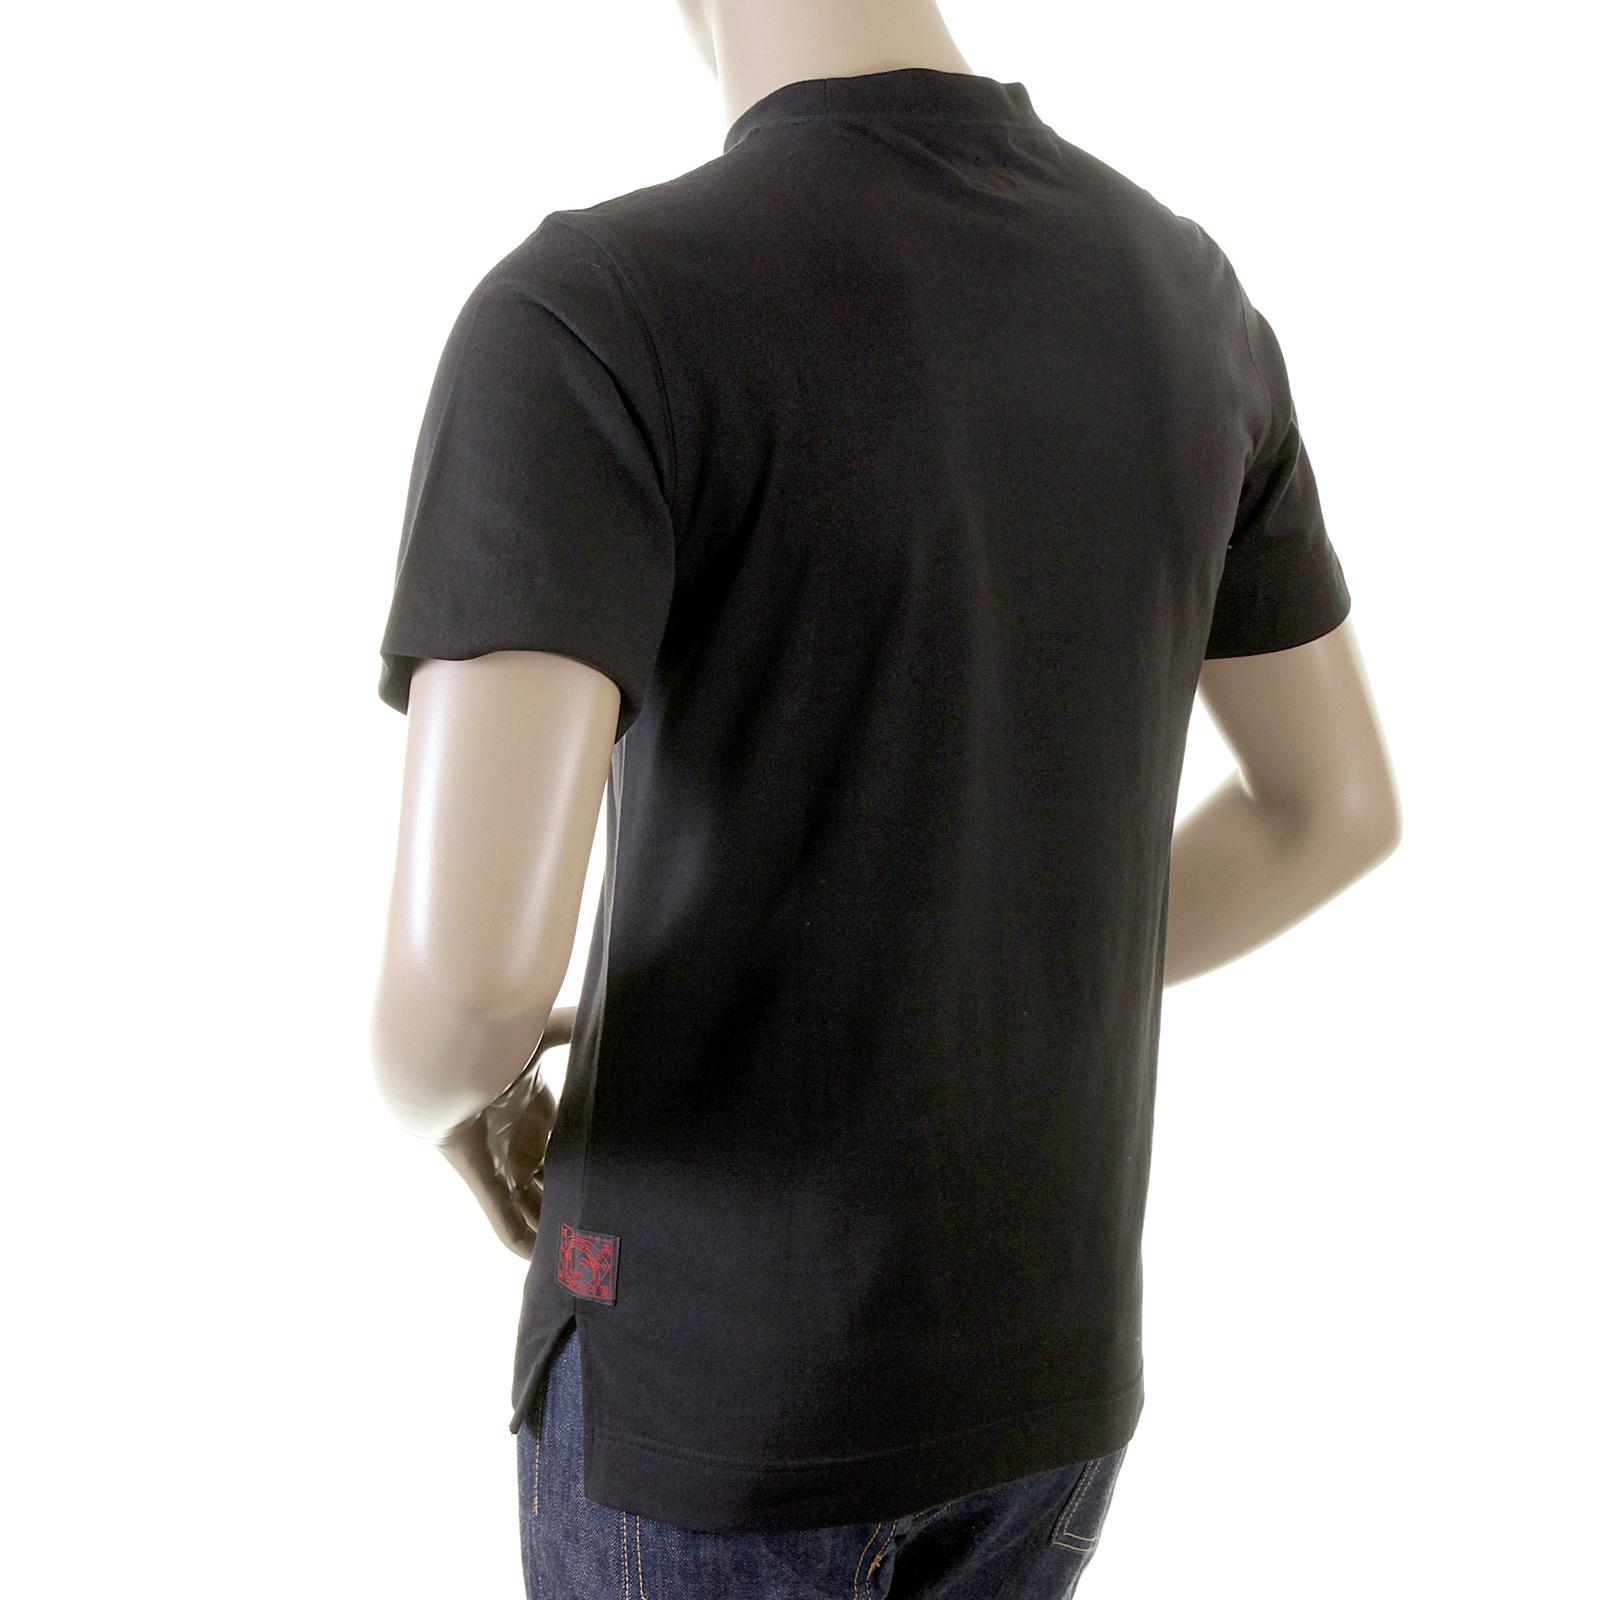 Black t shirt mens - Evisu Mens Black Crew Neck Short Sleeve Large Fitting Cotton T Shirt Evis2300